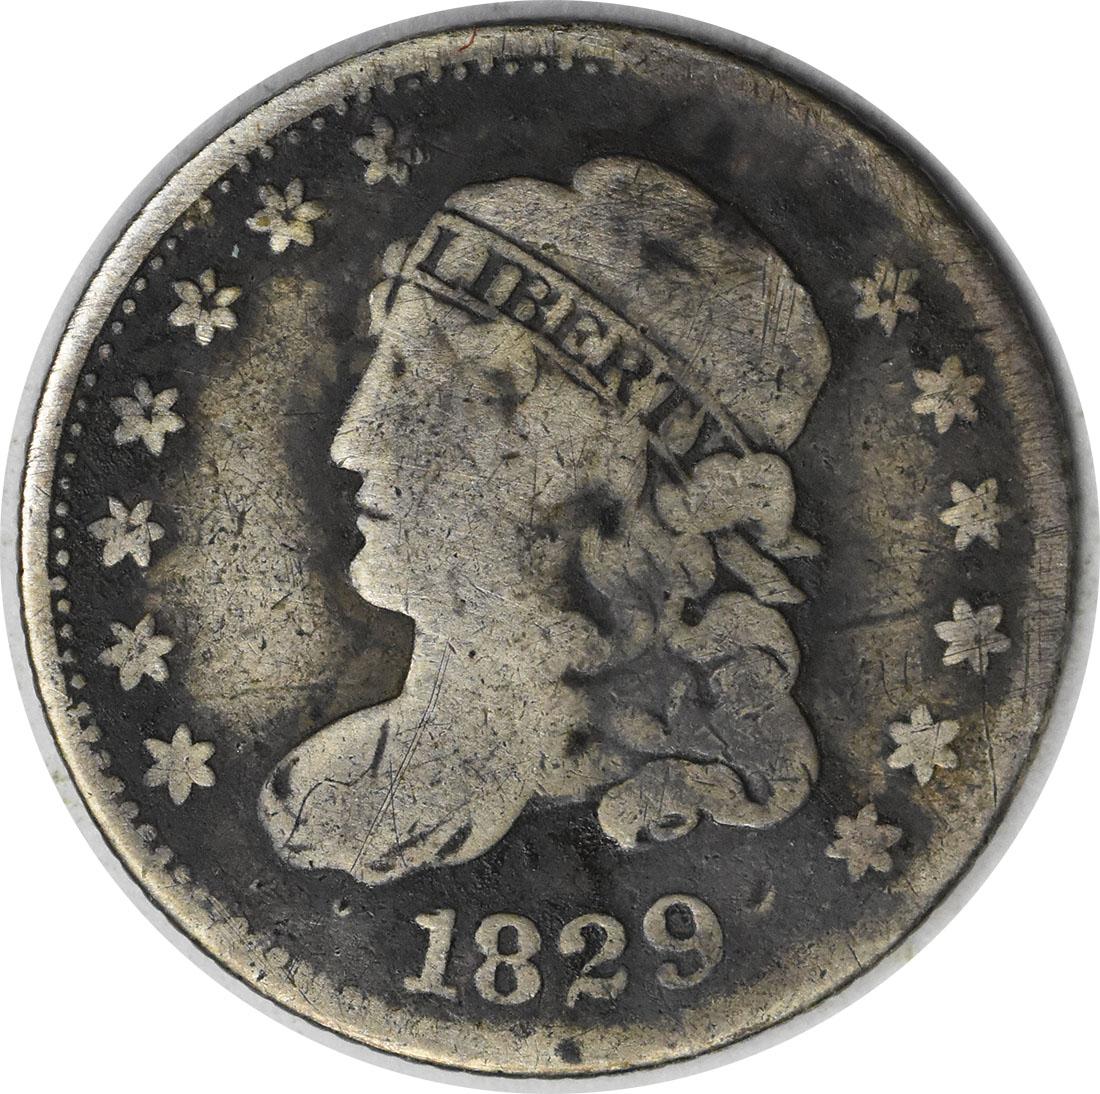 1829 Bust Silver Half Dime VG Uncertified